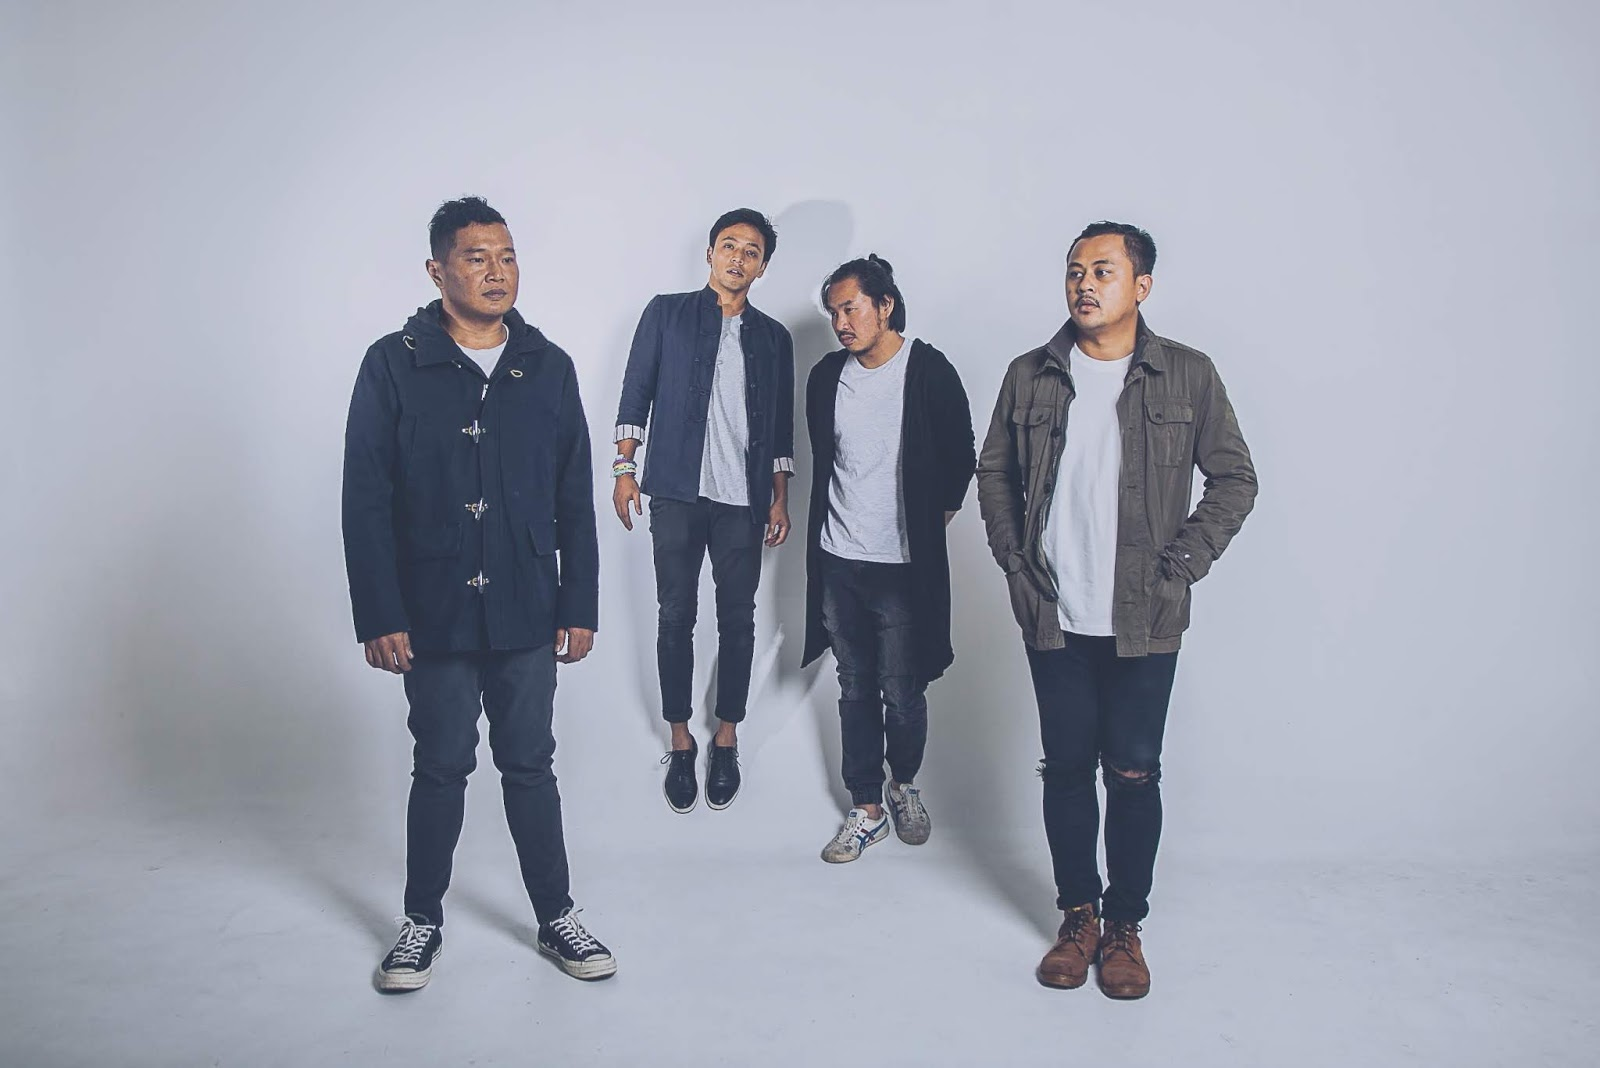 Lightcraft akan tampil di Big Mountain Music Festival 2019 Thailand